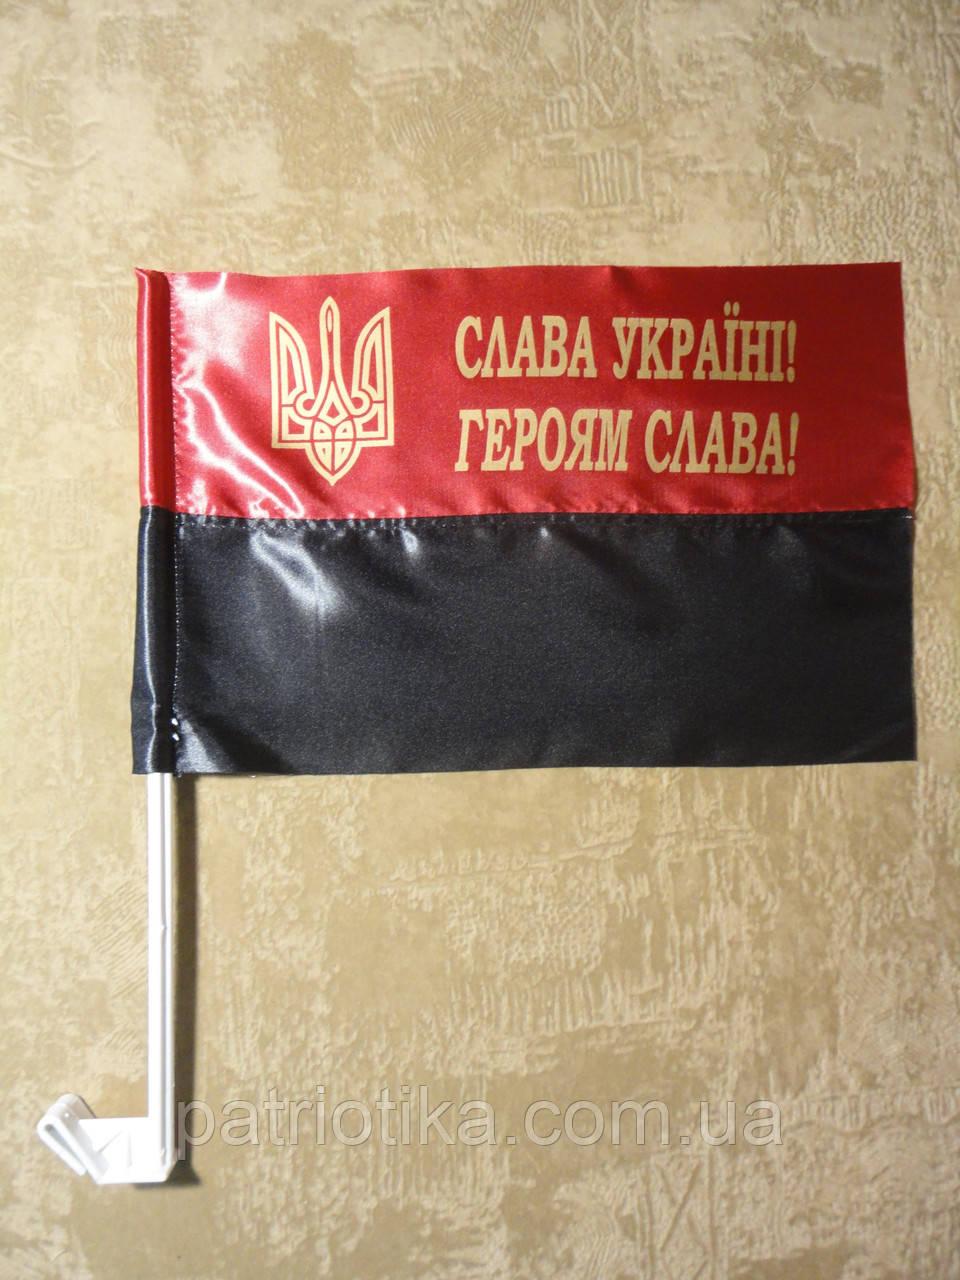 Упа прапор упа атлас слава україні